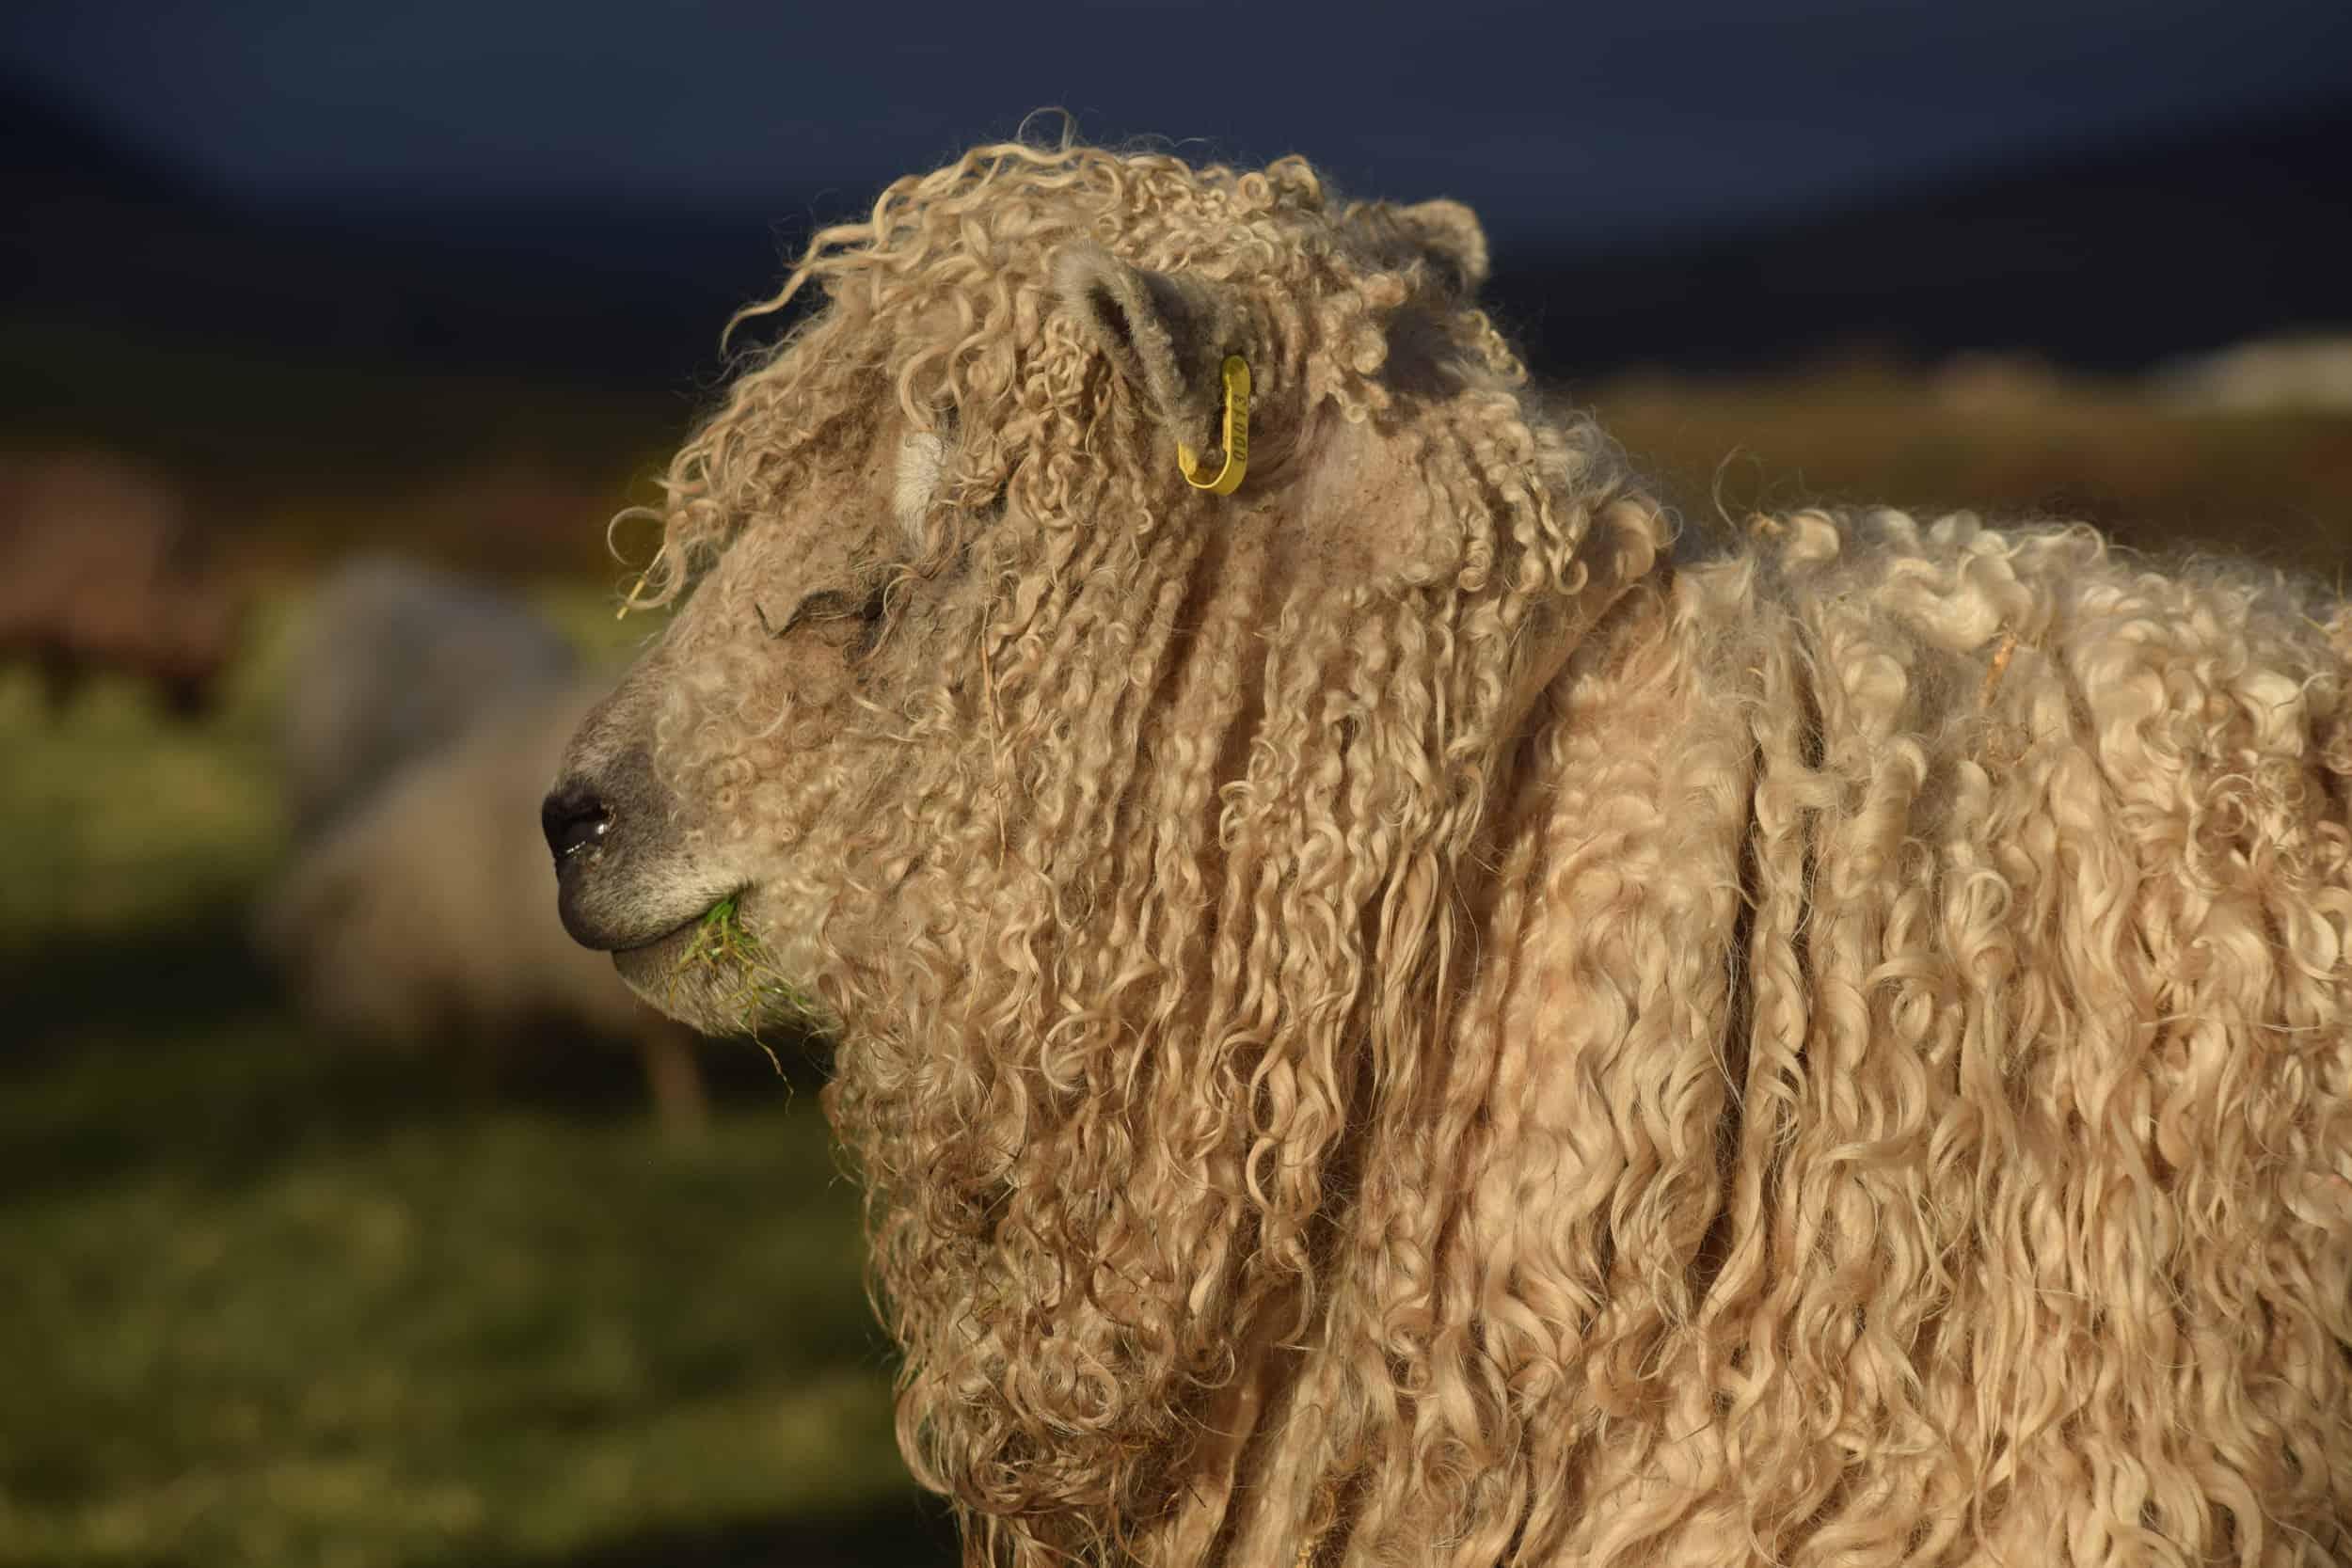 Alice patchwork sheep wensleydale cross greyface dartmoor gfd